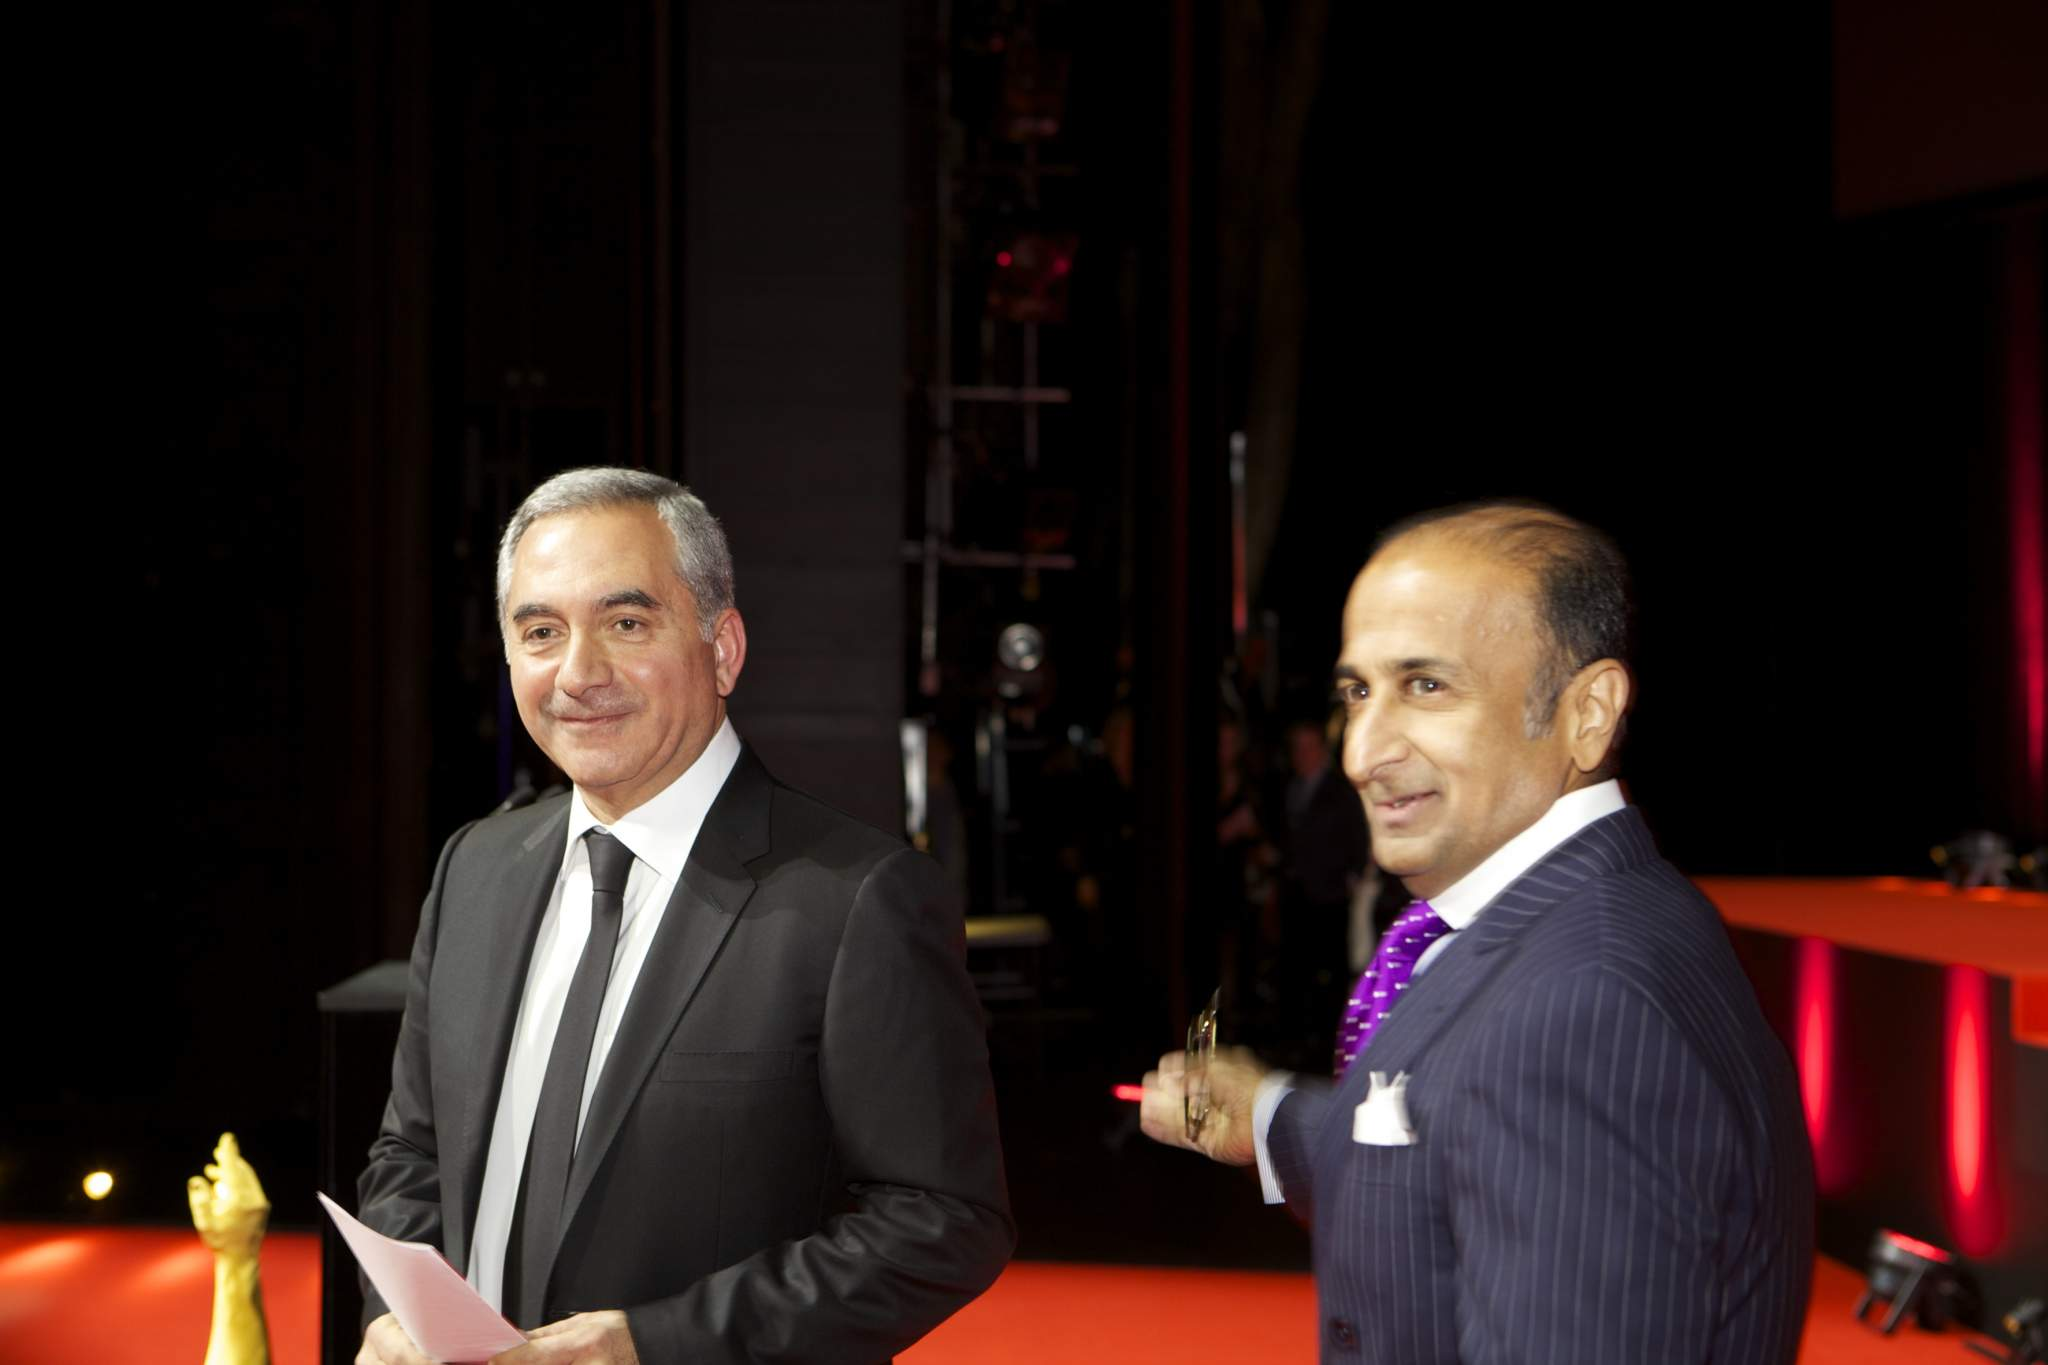 Claude Sfeir and Viren Bhagat, members of the Jury 2013